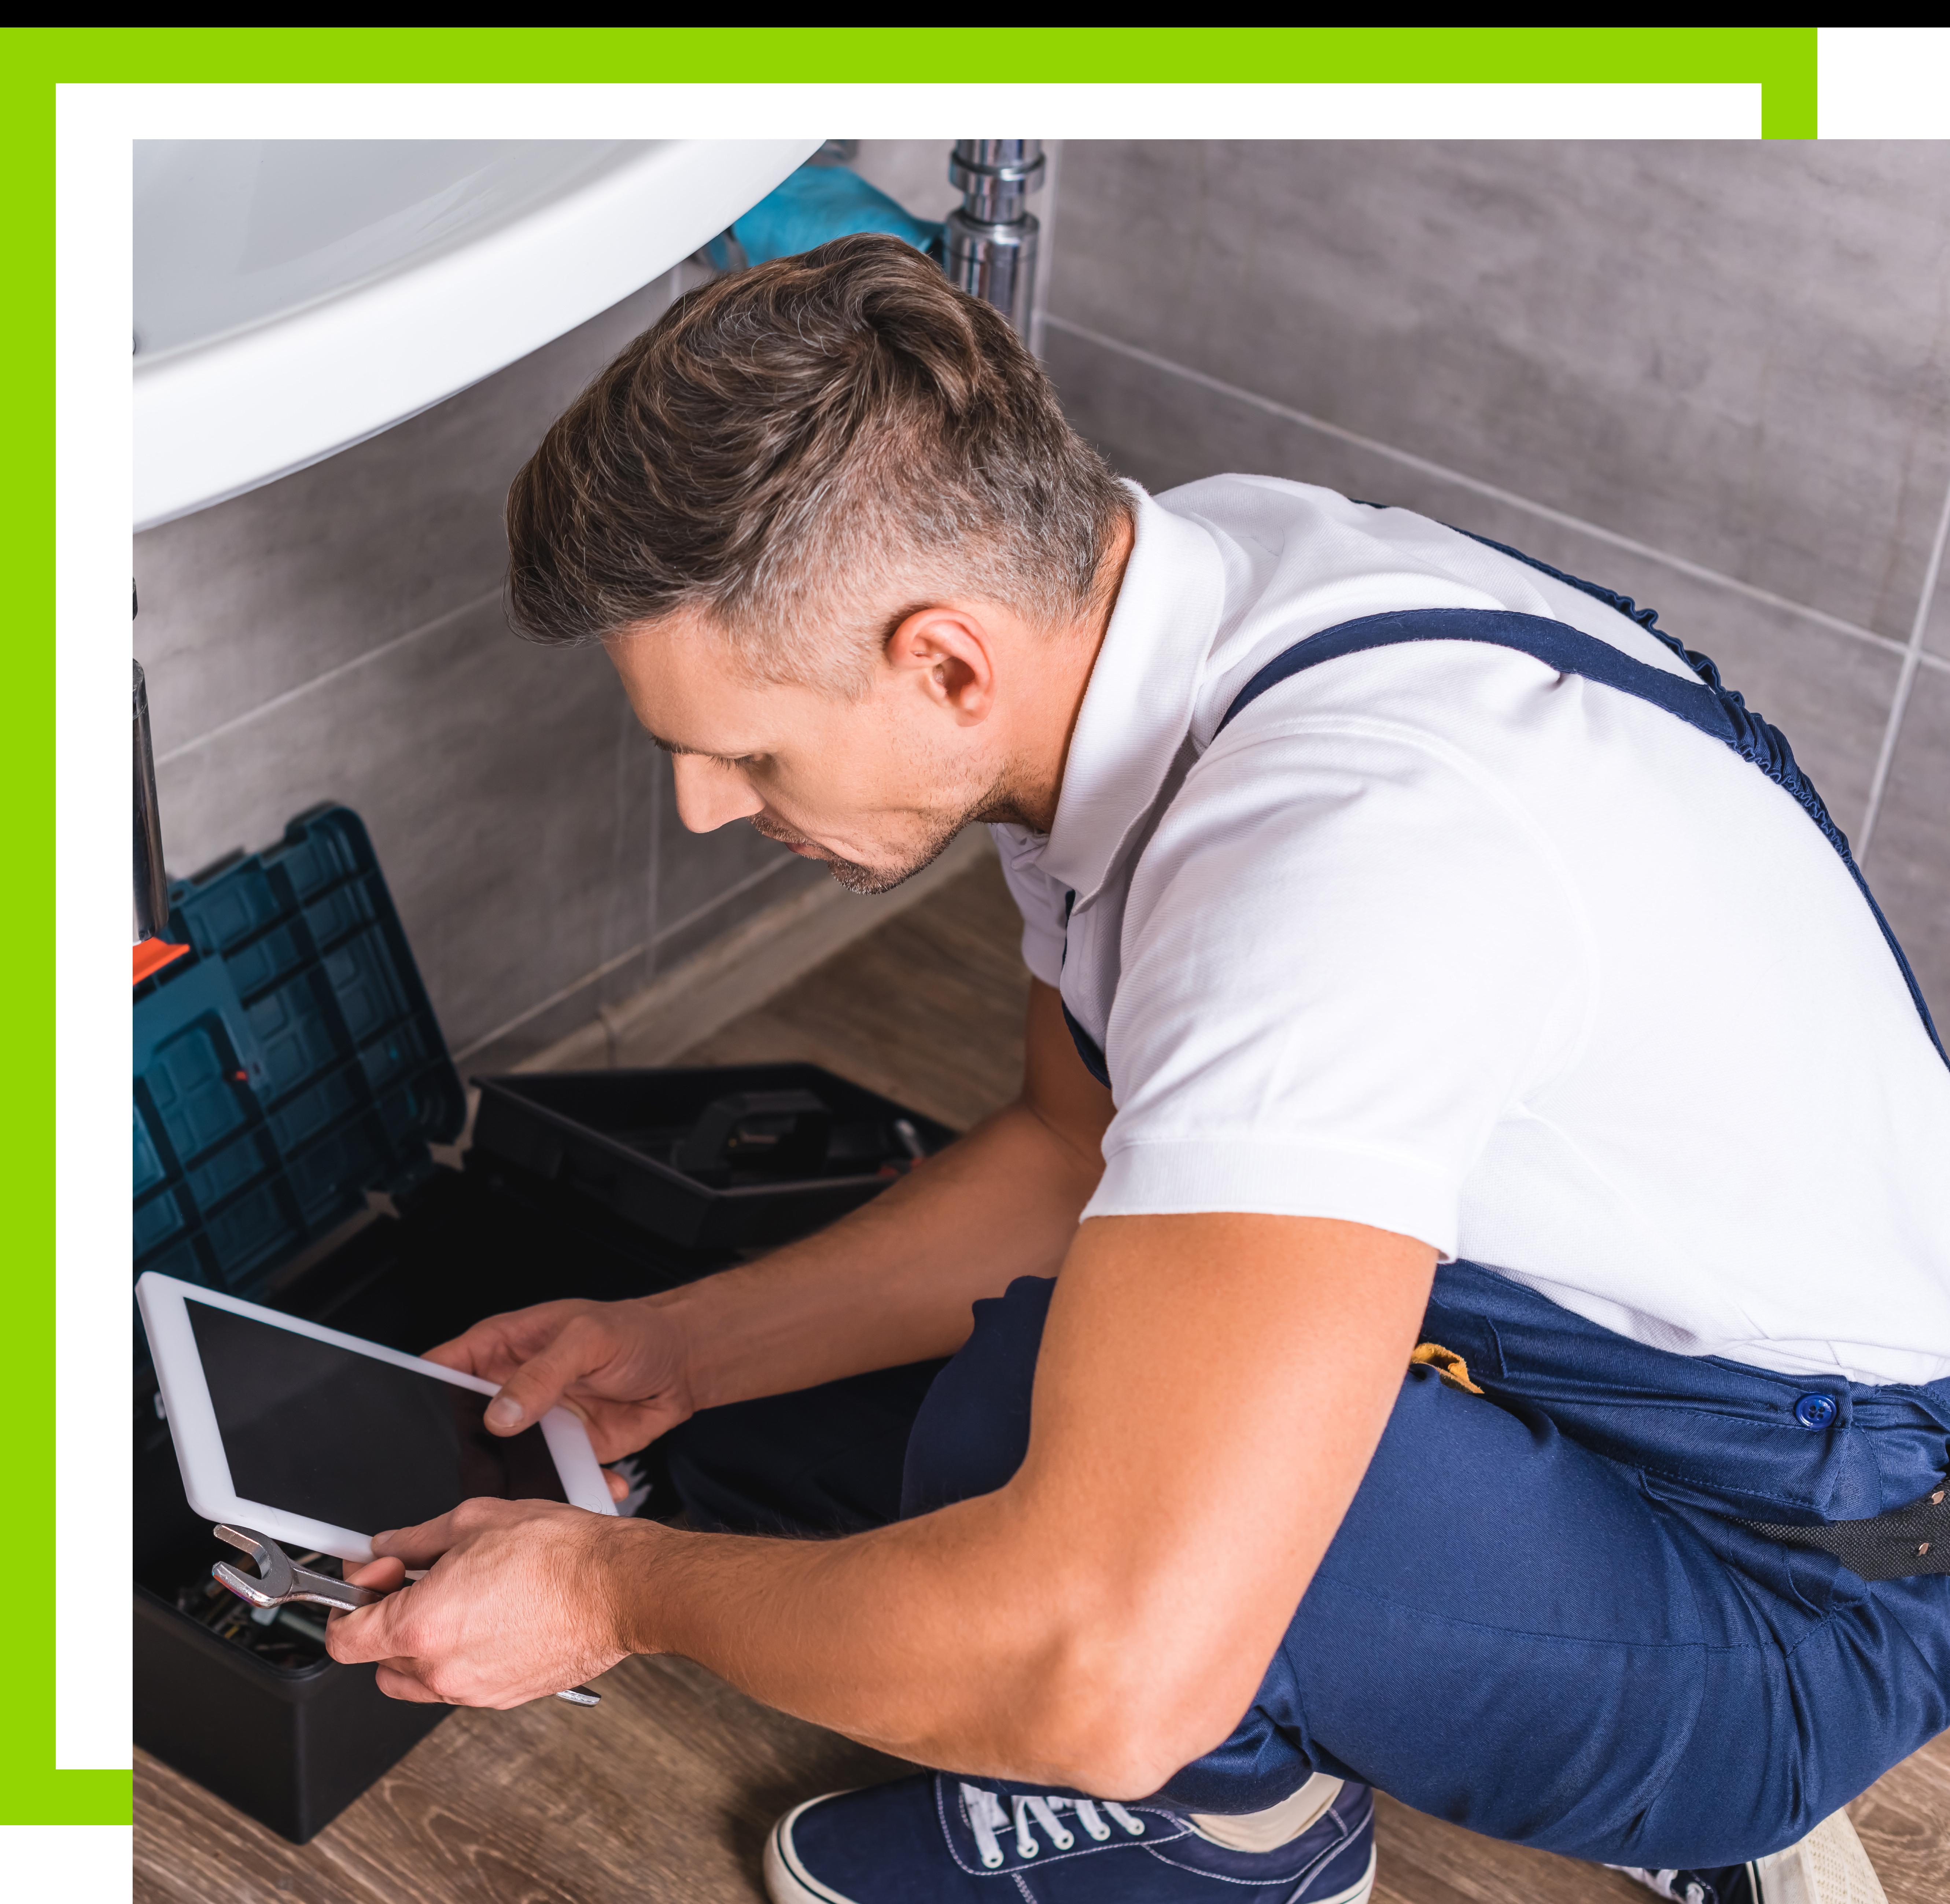 adult-repairman-sitting-on-floor-and-using-digital-X5RNBW7